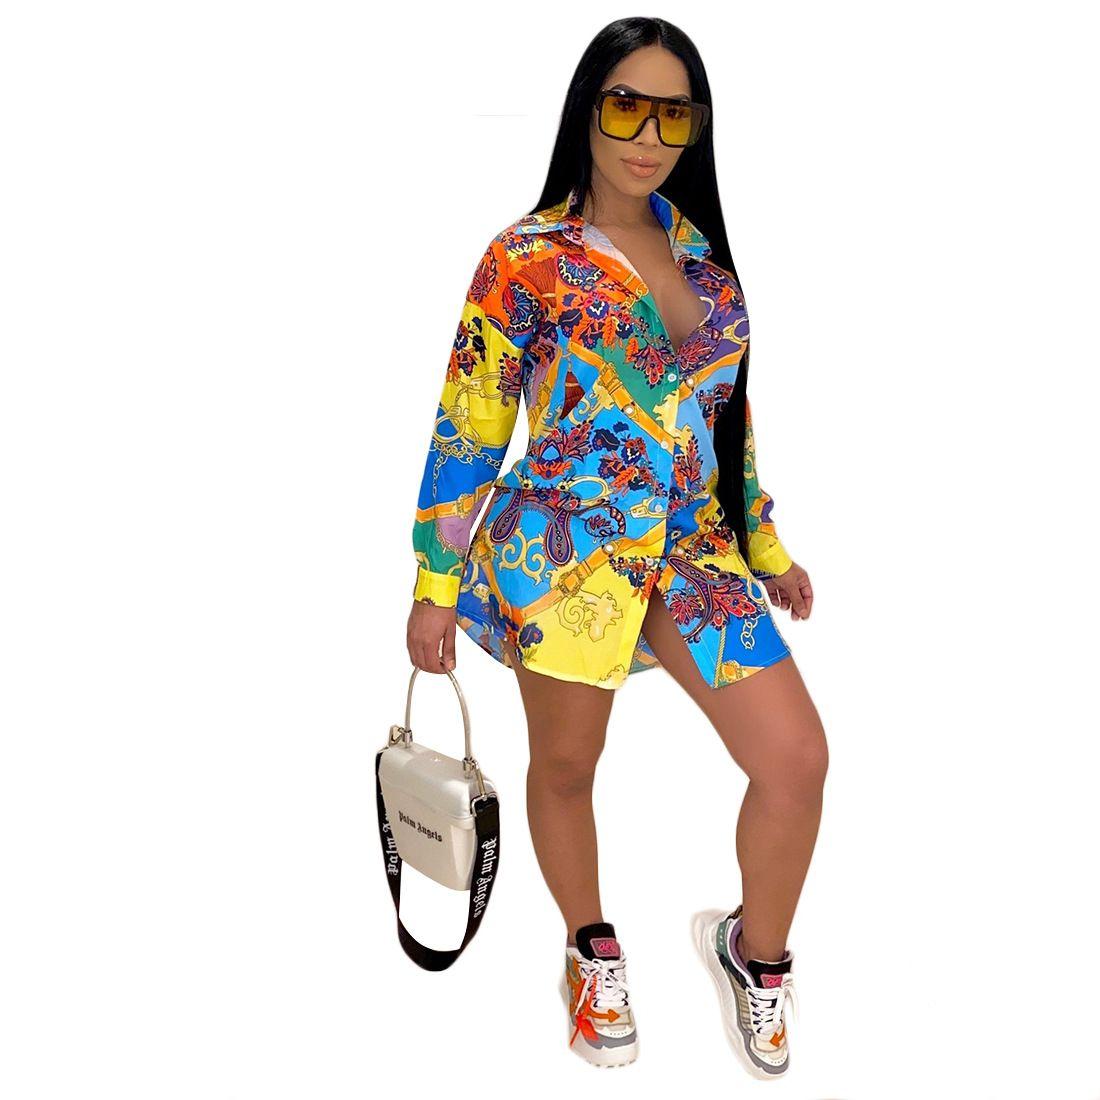 Sommer Street Drucken Hemd der Frauen Kleid Vintage elegante Bluse Frauen Herbst Revers Langarm-loses Shirt T-Shirt Minikleid